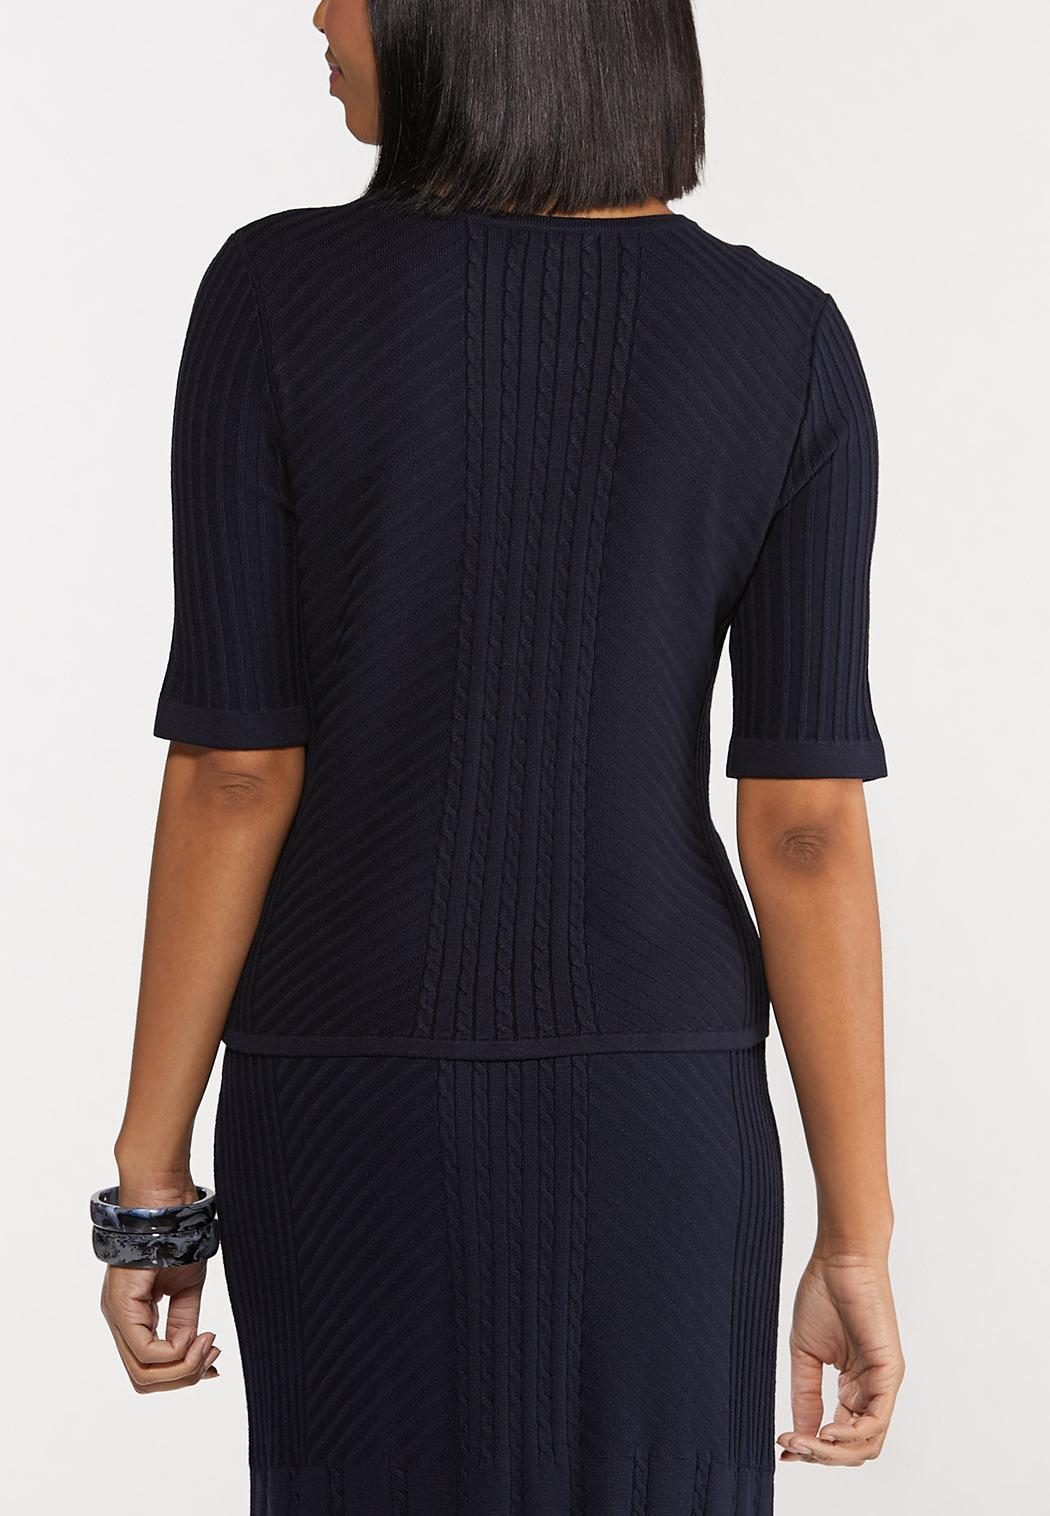 Plus Size Navy Sweater (Item #44549941)